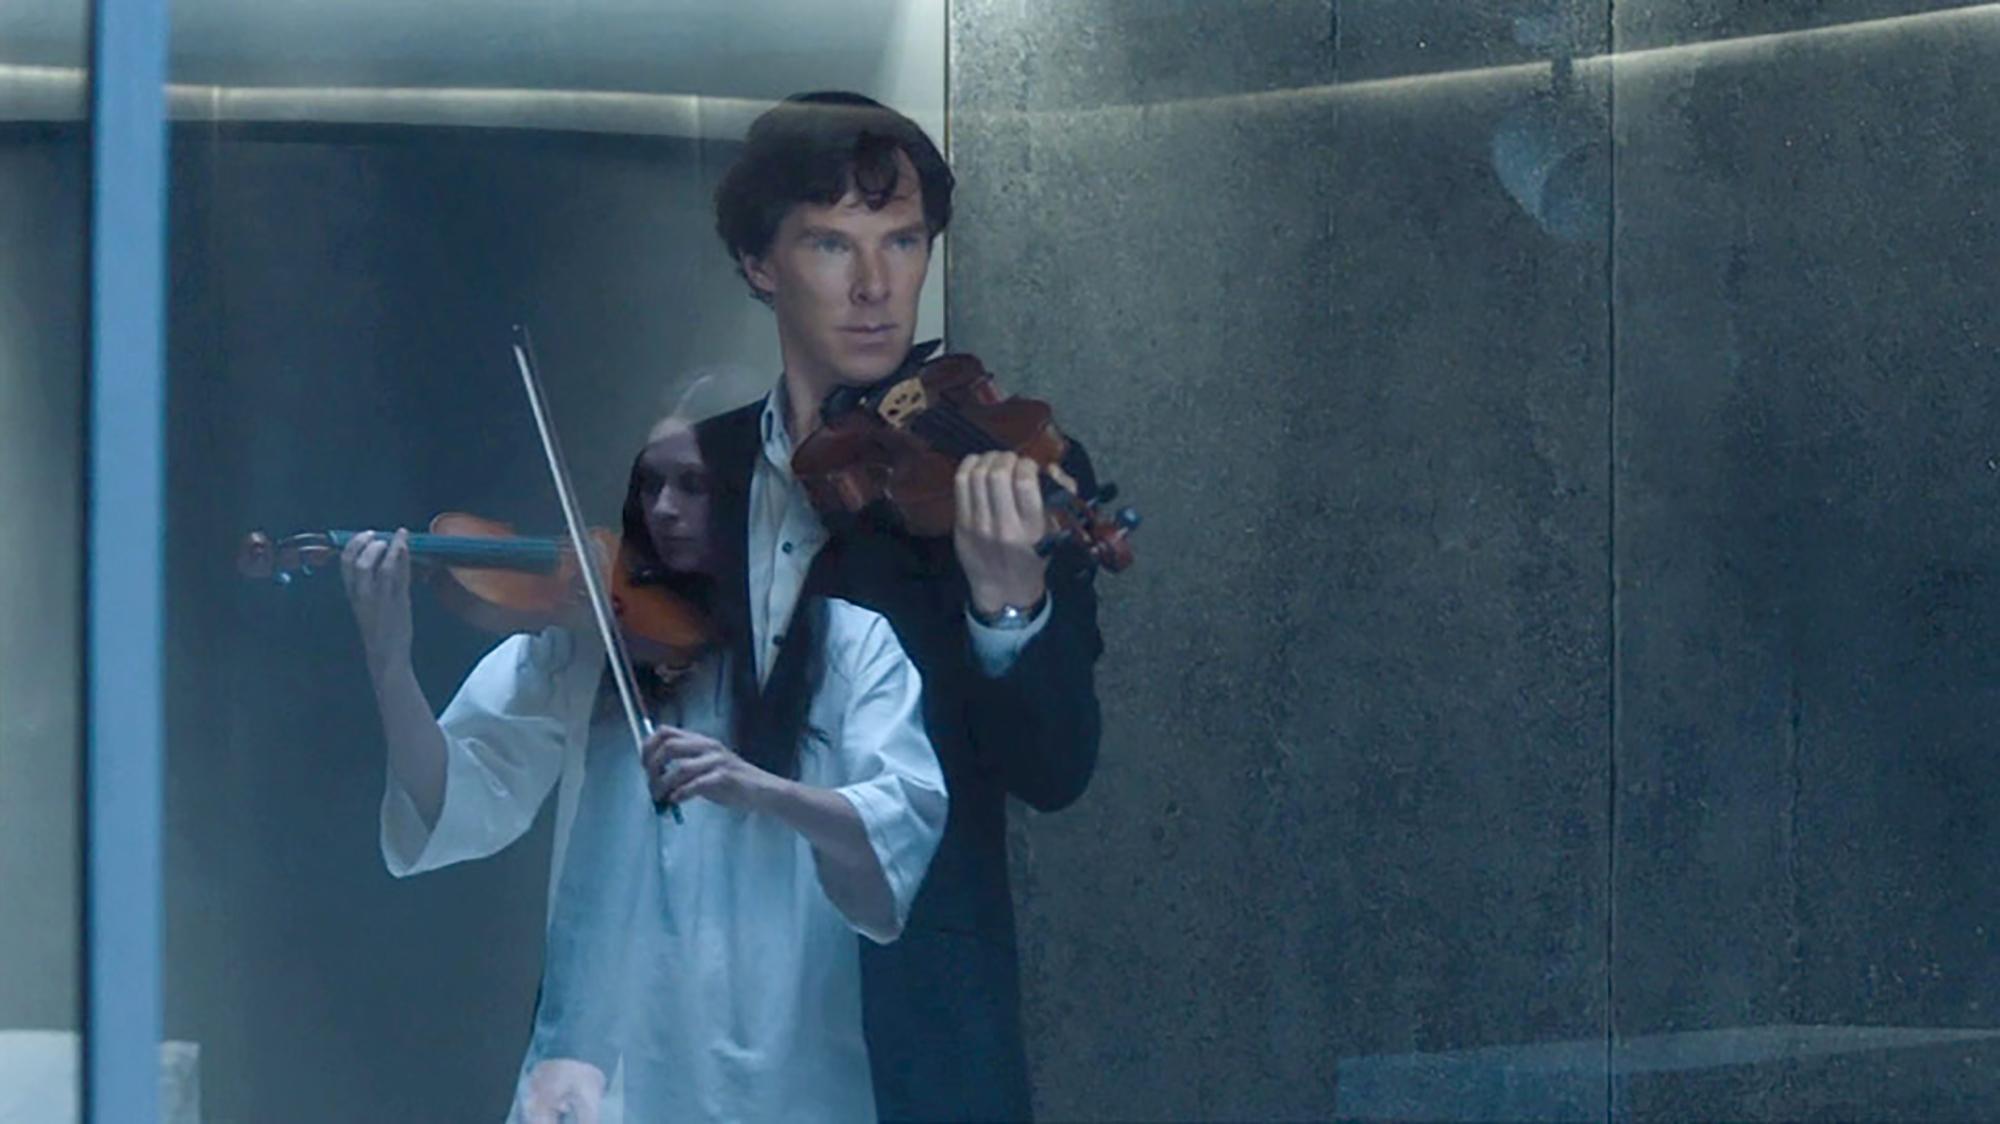 'Sherlock' Season 4 is Getting a Concert | Anglophenia ...